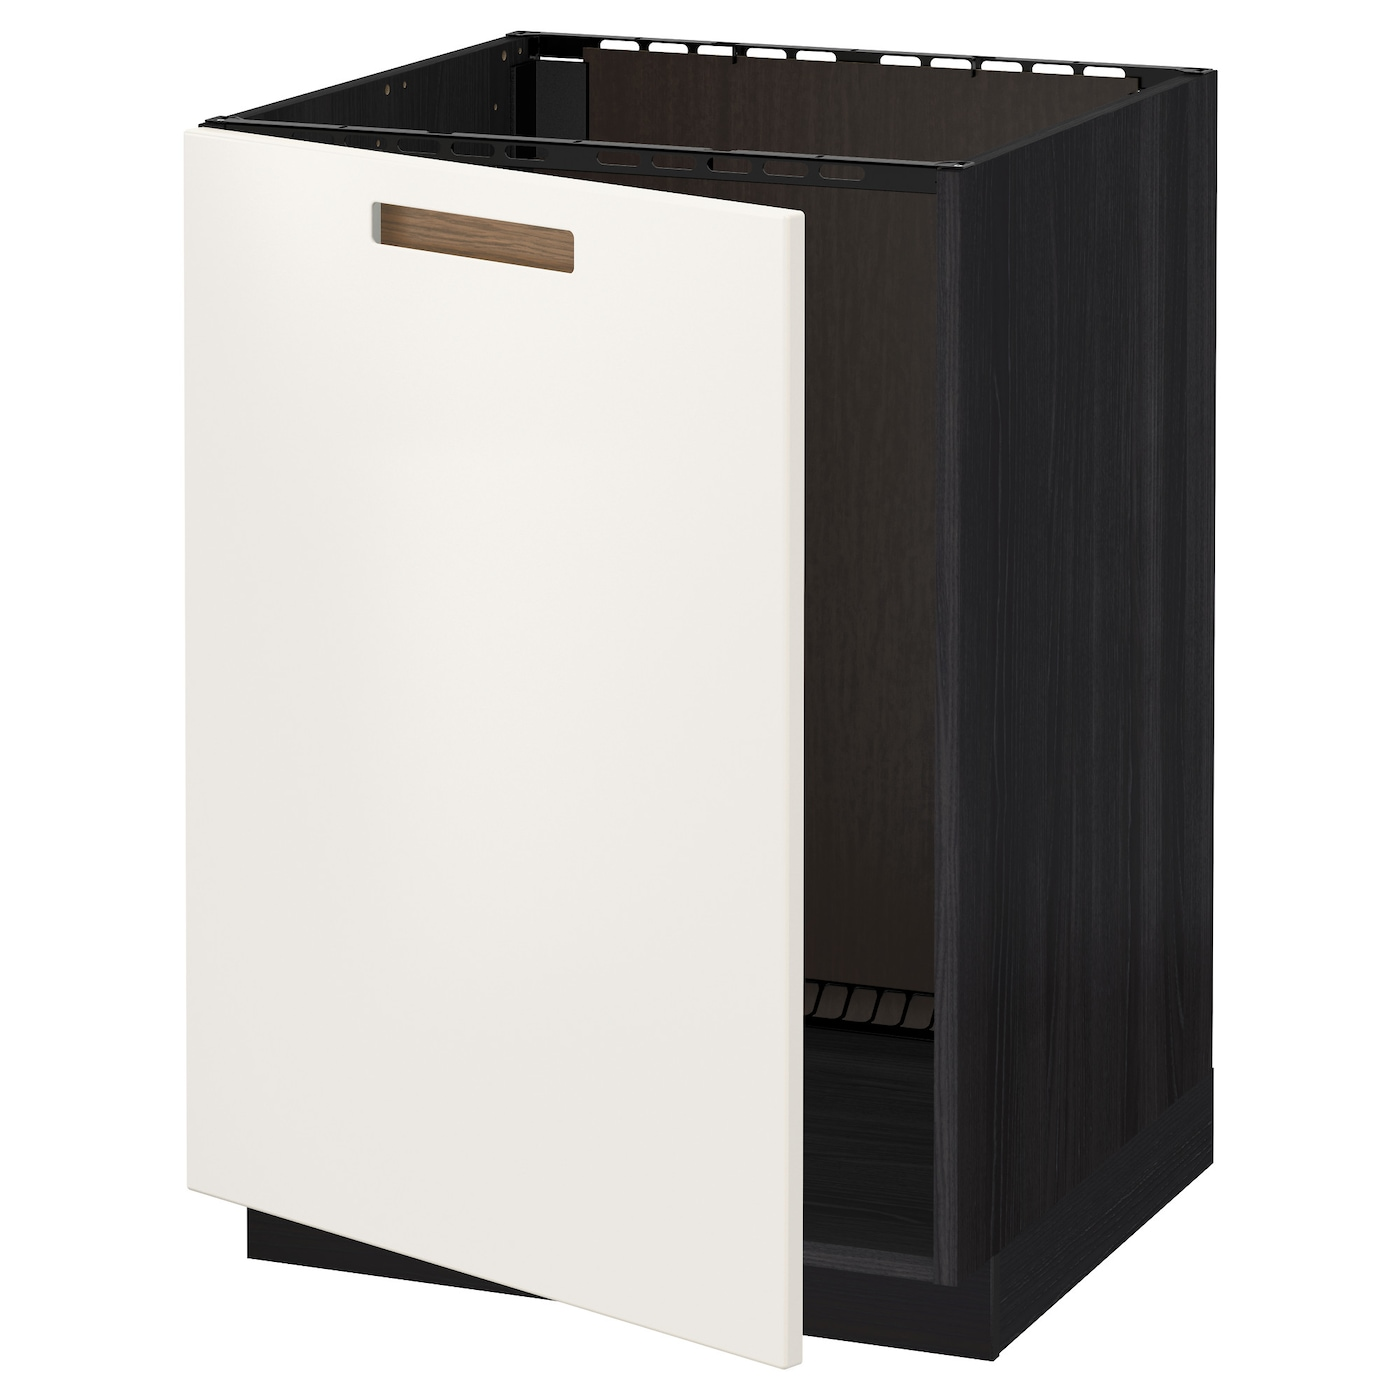 Metod base cabinet for sink black m rsta white 60x60 cm ikea for Black kitchen base cabinets